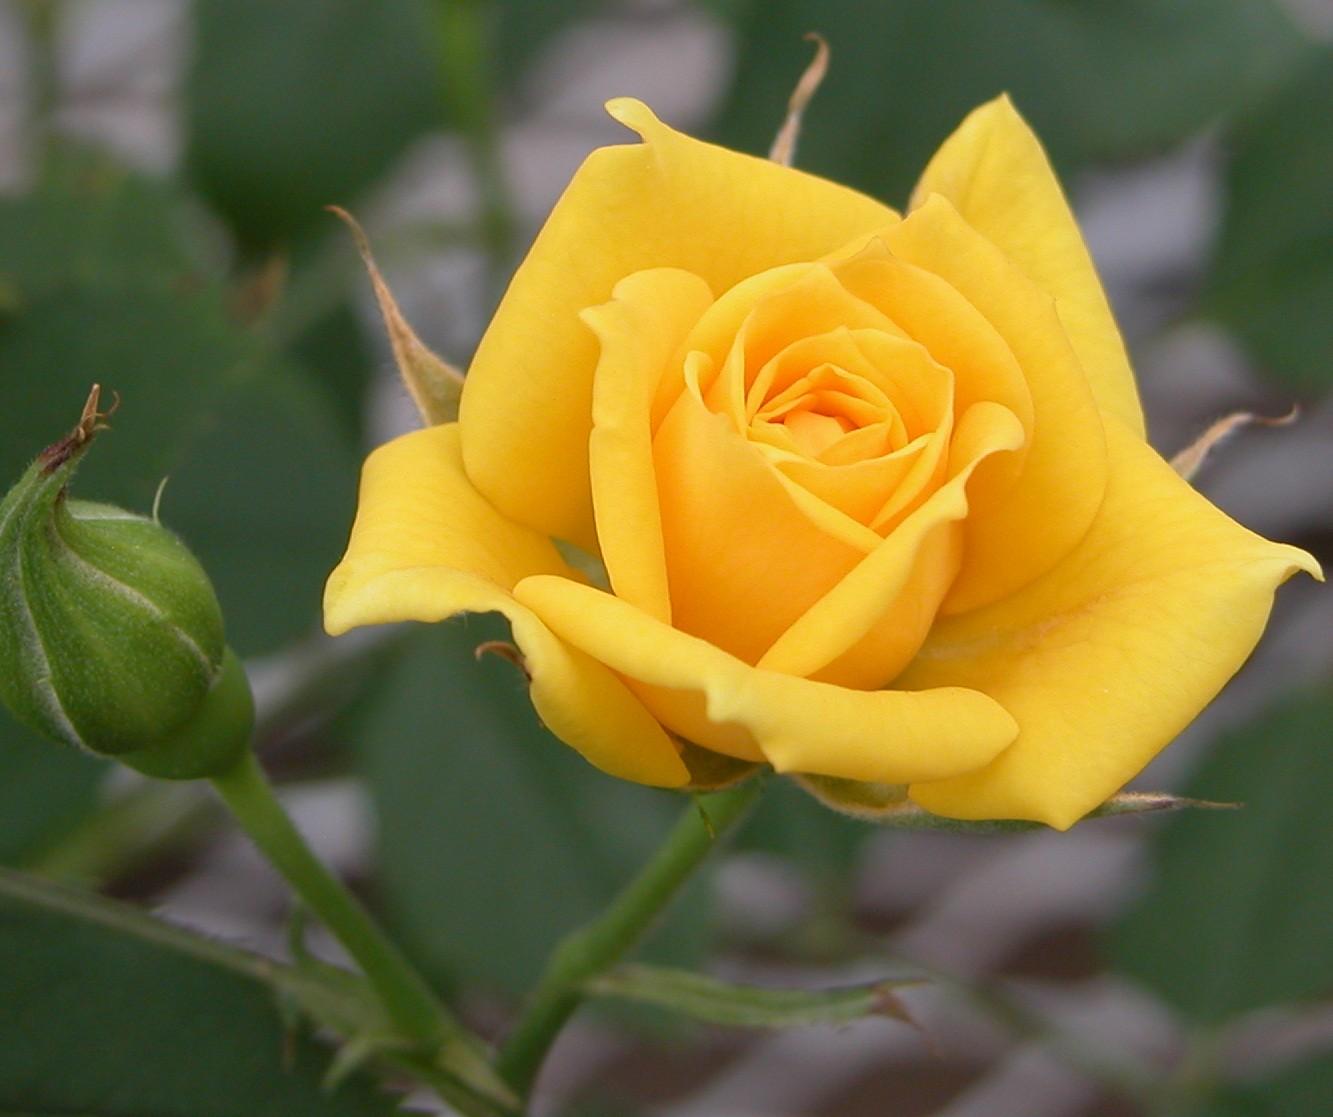 Yellow Rose Image Download 1333x1117 Download Hd Wallpaper Wallpapertip